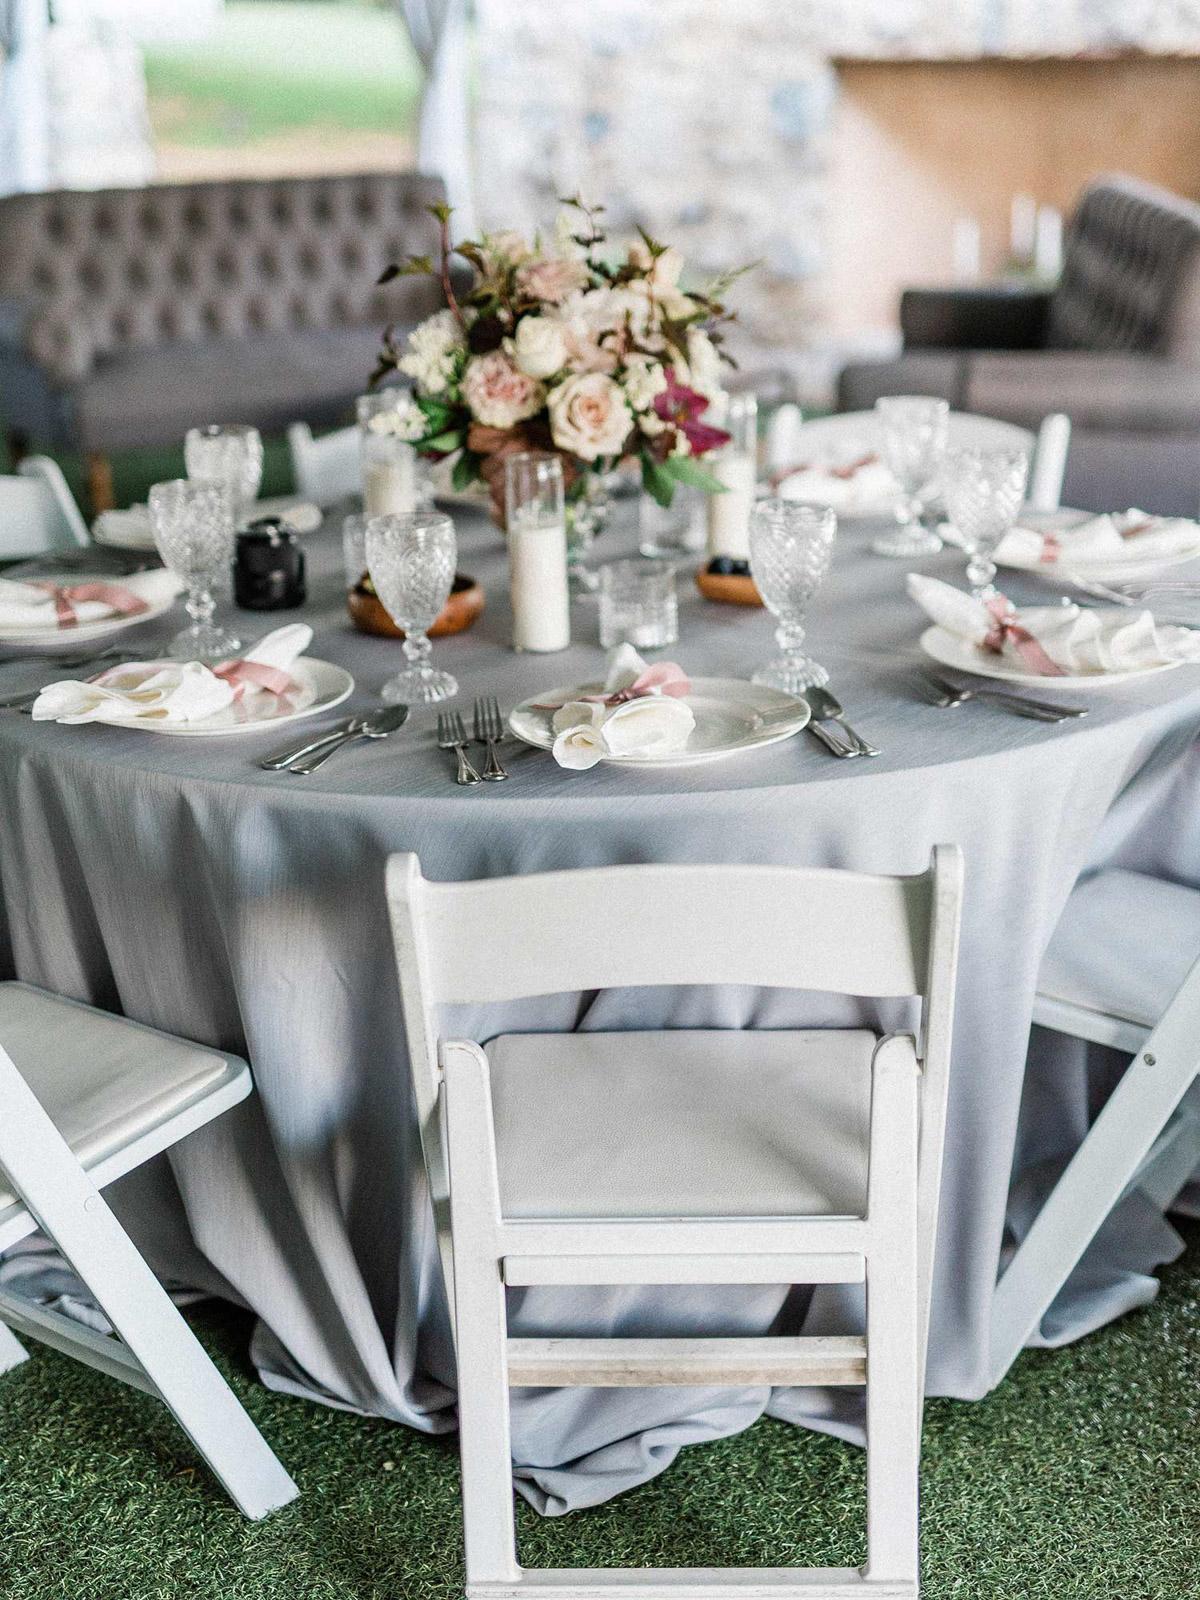 destiny-dawn-photography-vineyard-bride-swish-list-knollwood-golf-and-country-club-ancaster-wedding-editorial-47.jpg